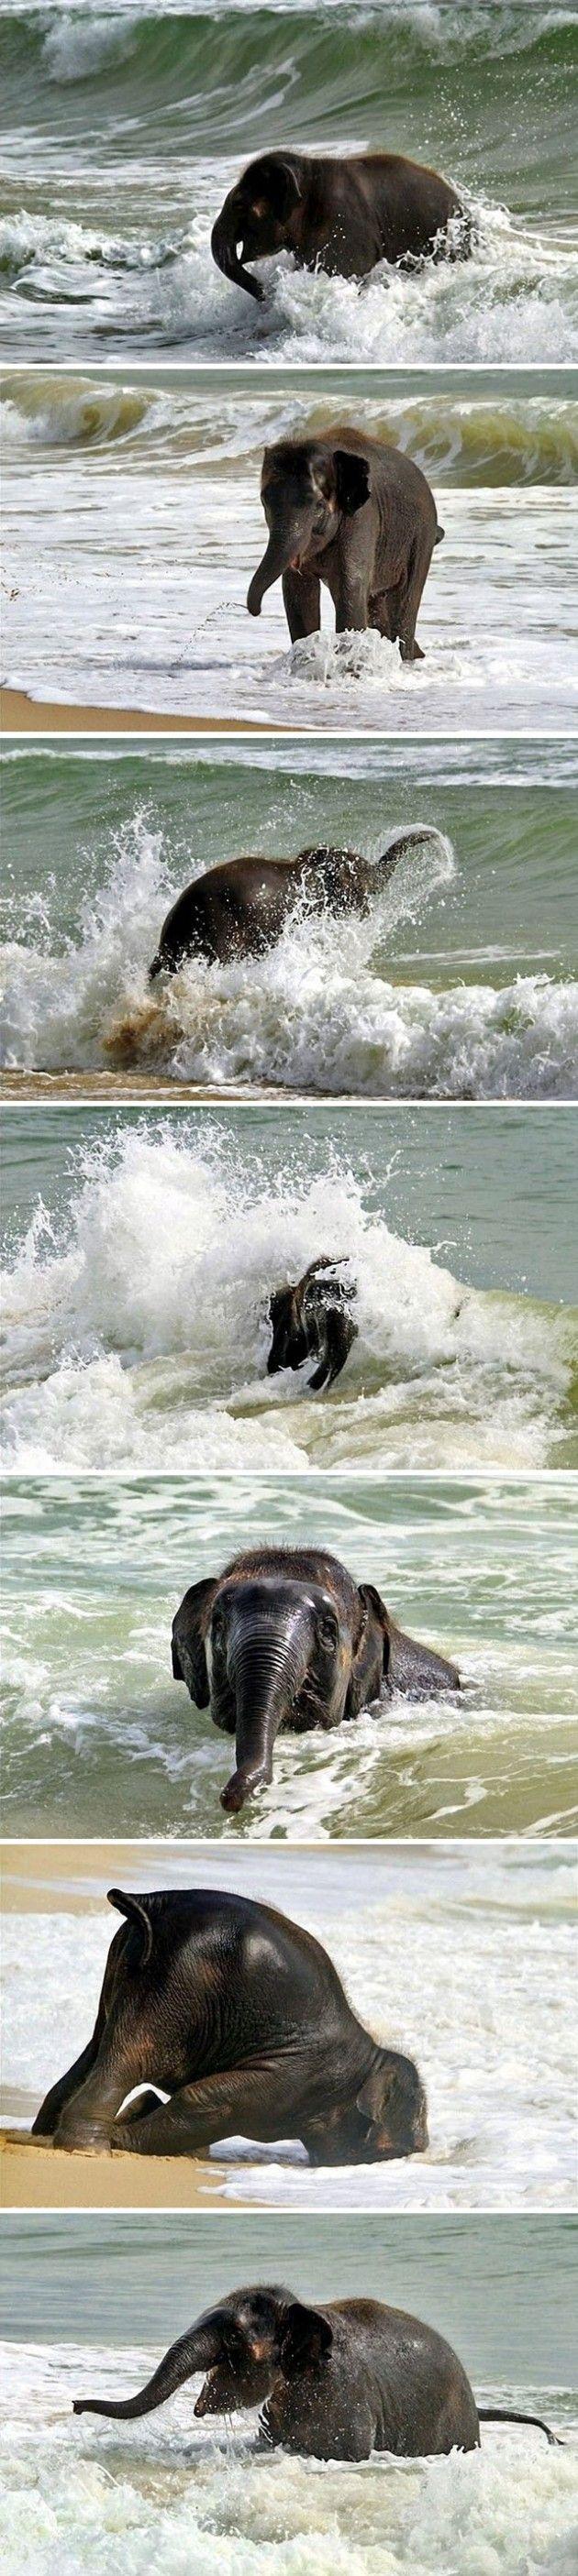 beach fun!Happy Baby, Baby Elephants, The Face, The Ocean, At The Beach, Happy Happy Happy, Happy Elephant, Animal, The Sea